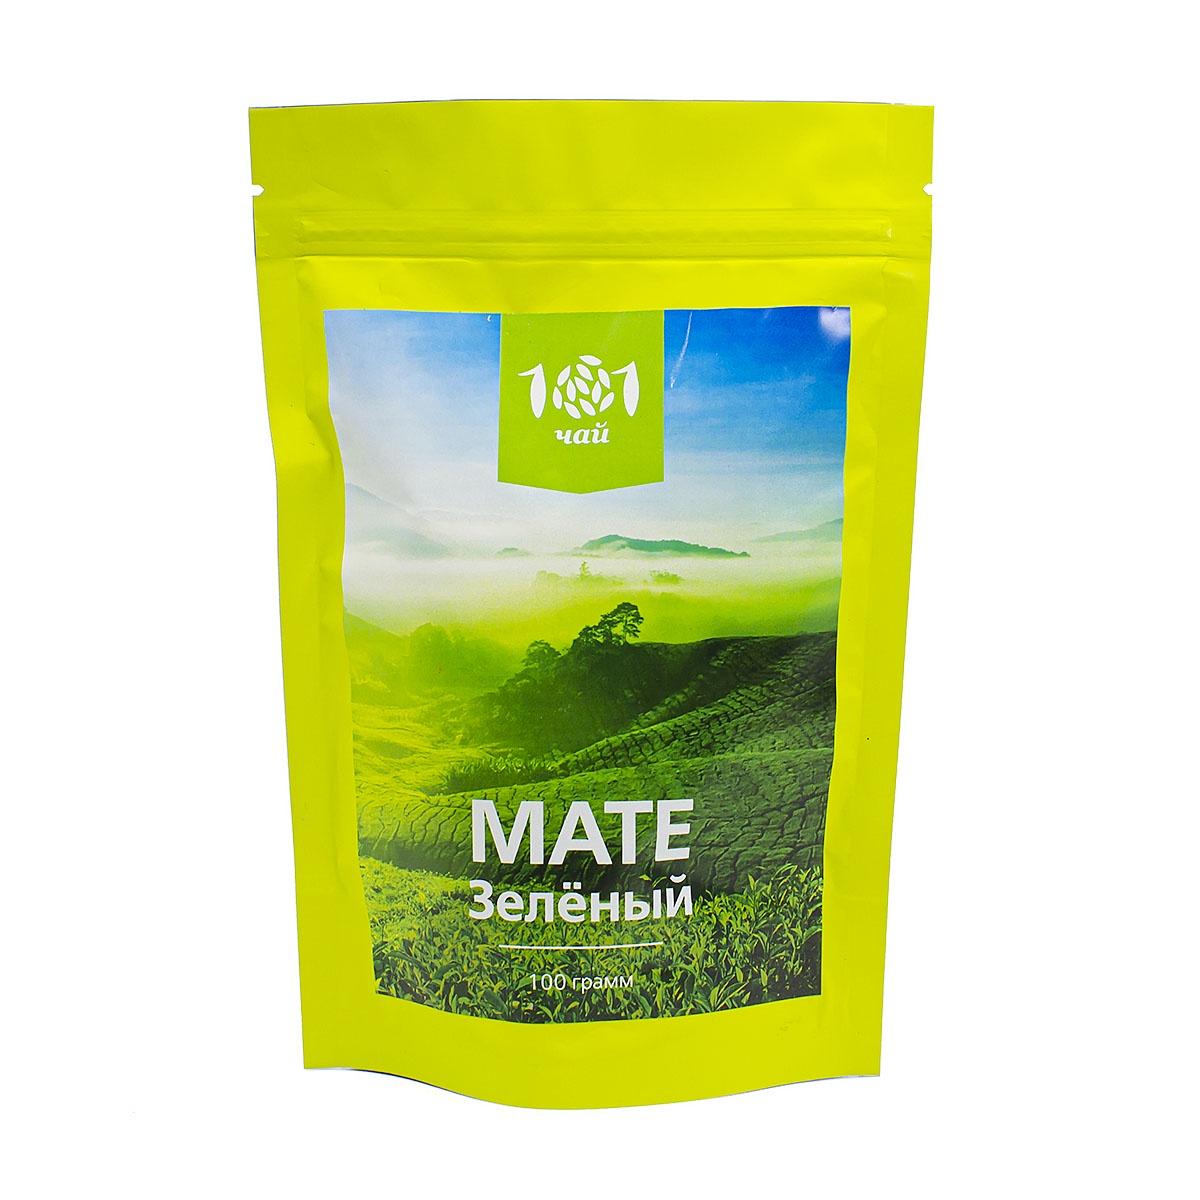 Чай Мате Зелёный, 100 г витамины 365 everyday value